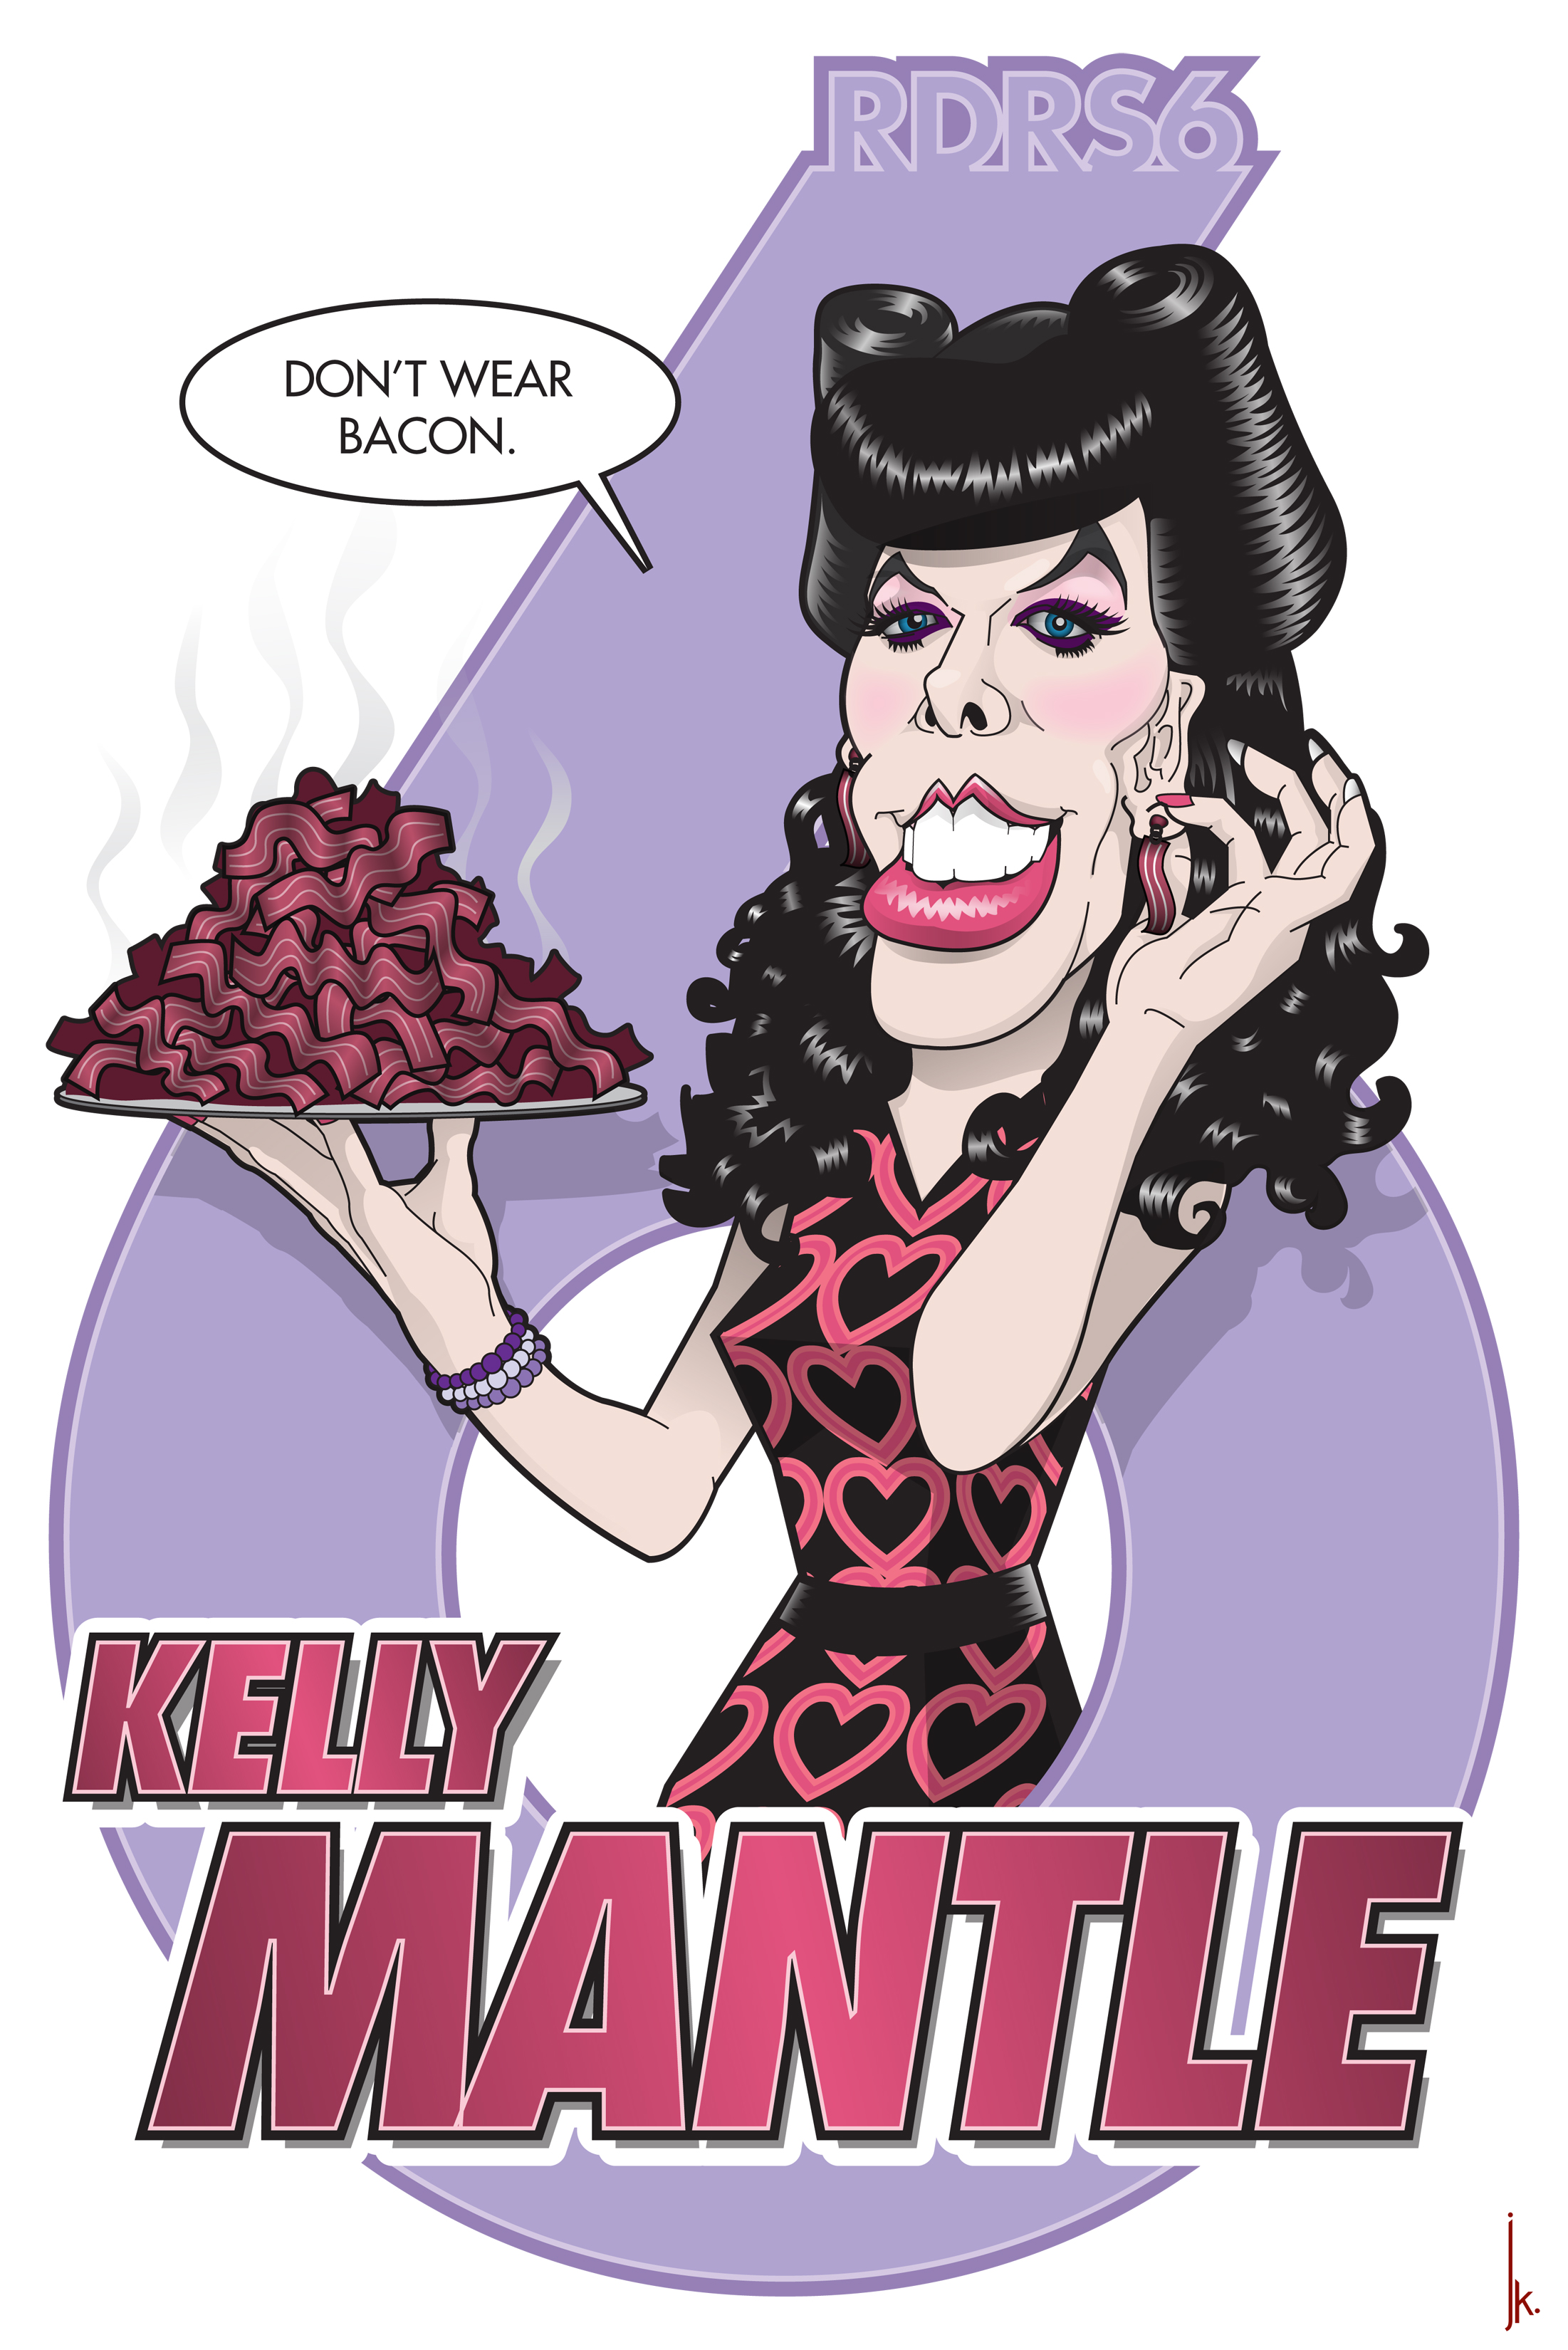 Kelly_Mantle_F_web.jpg